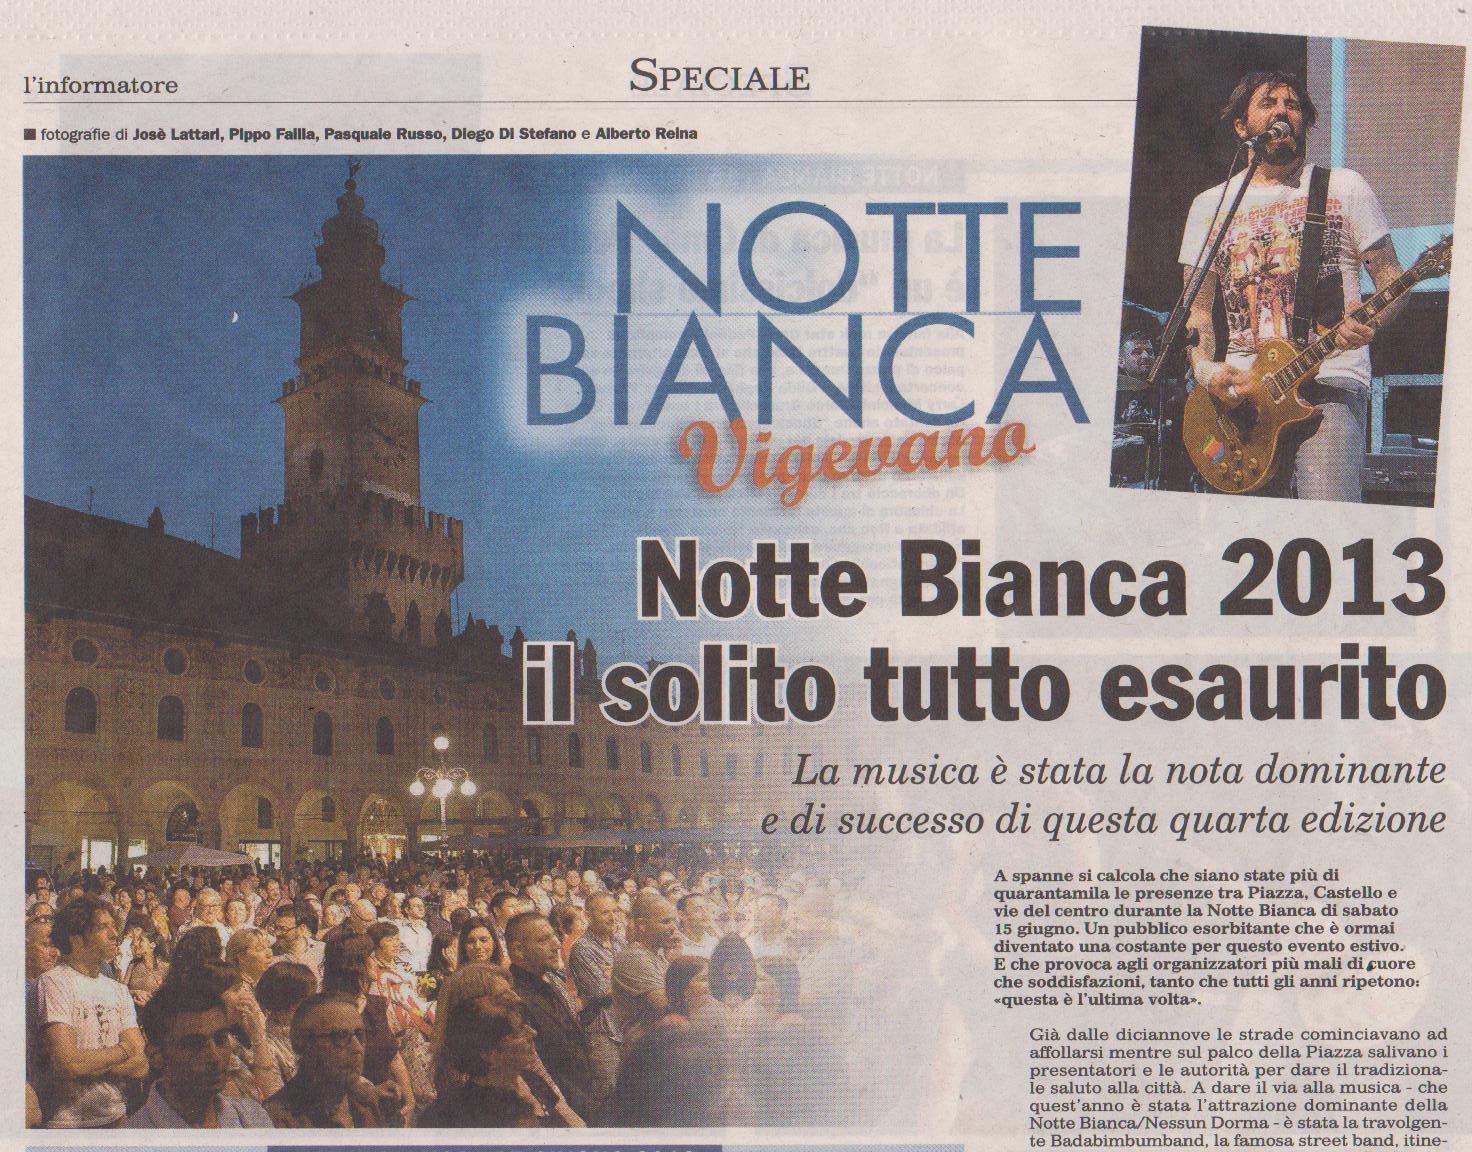 Notte Bianca 2013 Grande Successo